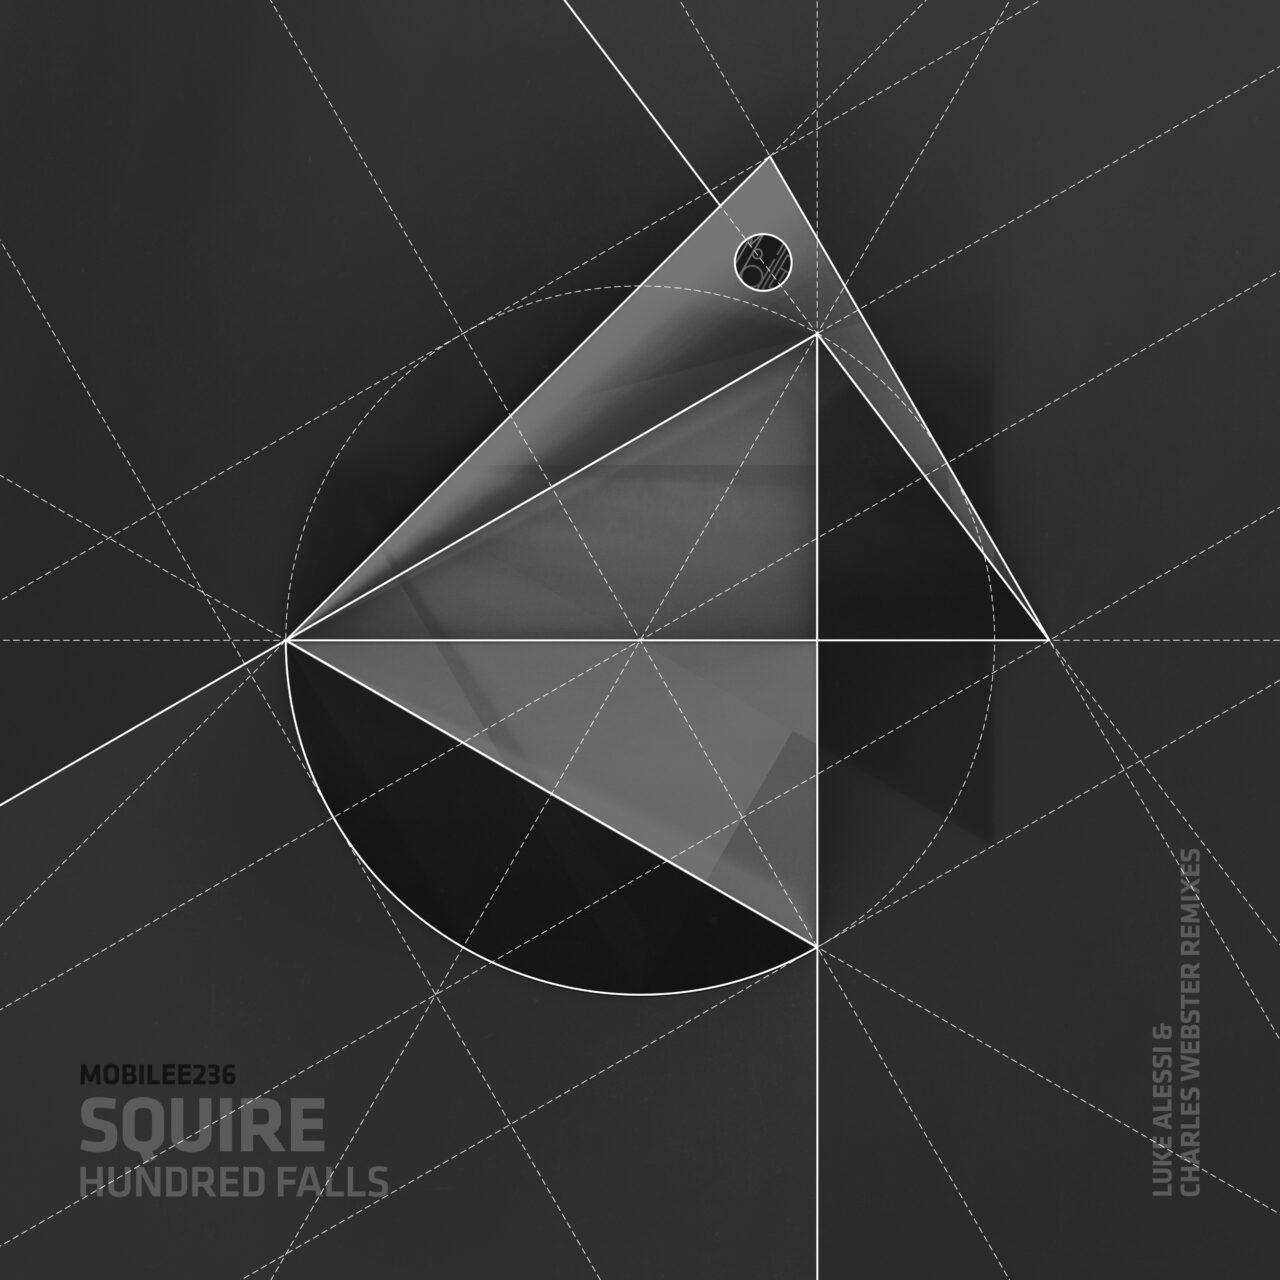 Mobilee236_Squire_HundredFalls_Remixes_construction_DEF